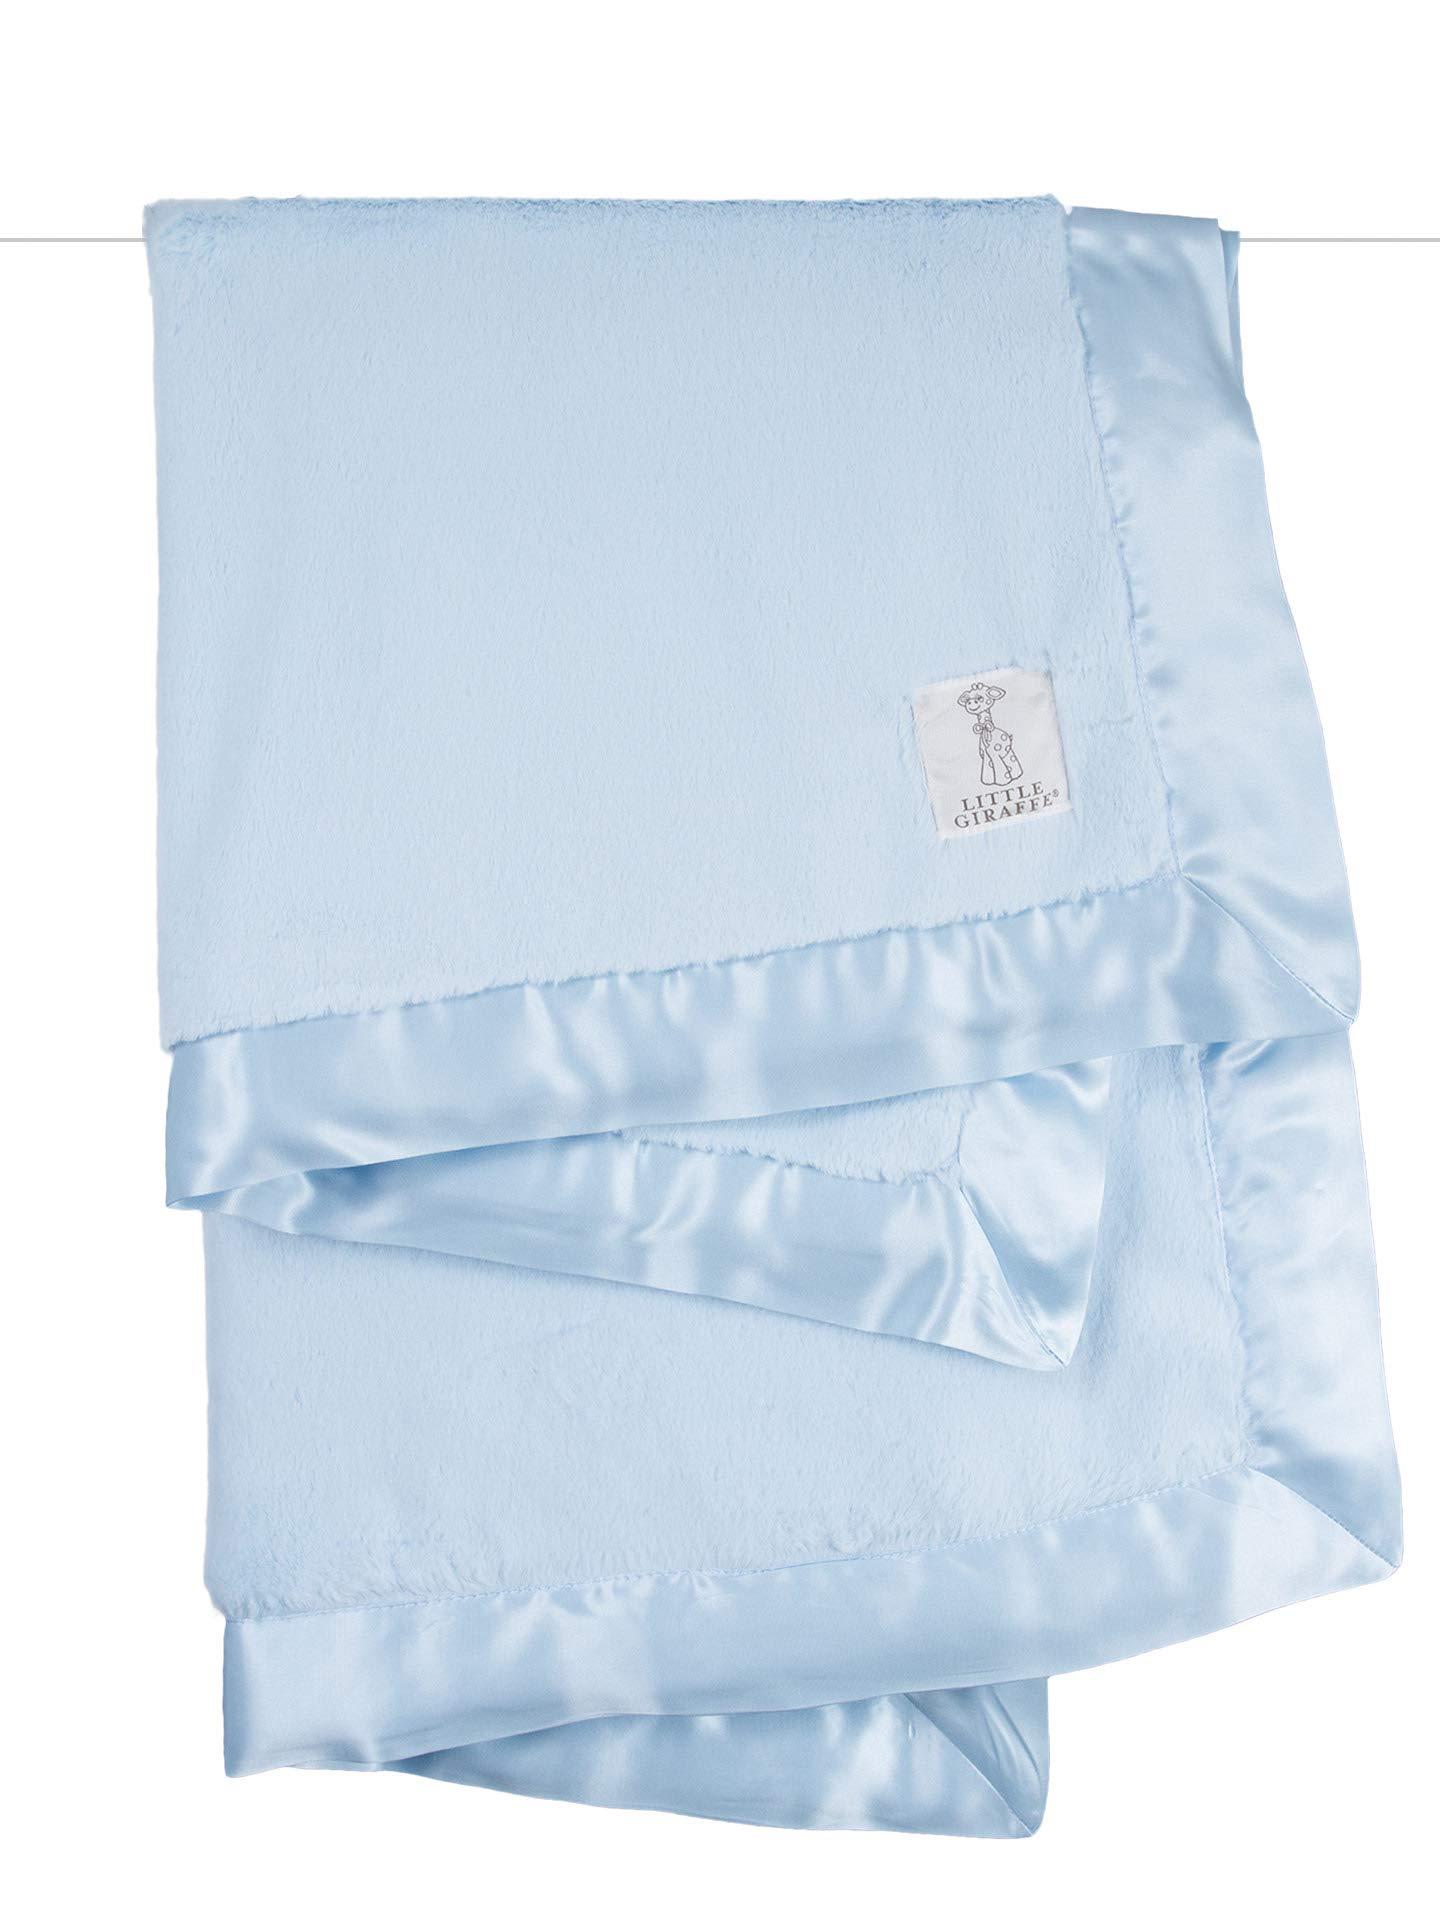 Little Giraffe Luxe Stroller Baby Blanket, Blue, 29'' x 35''